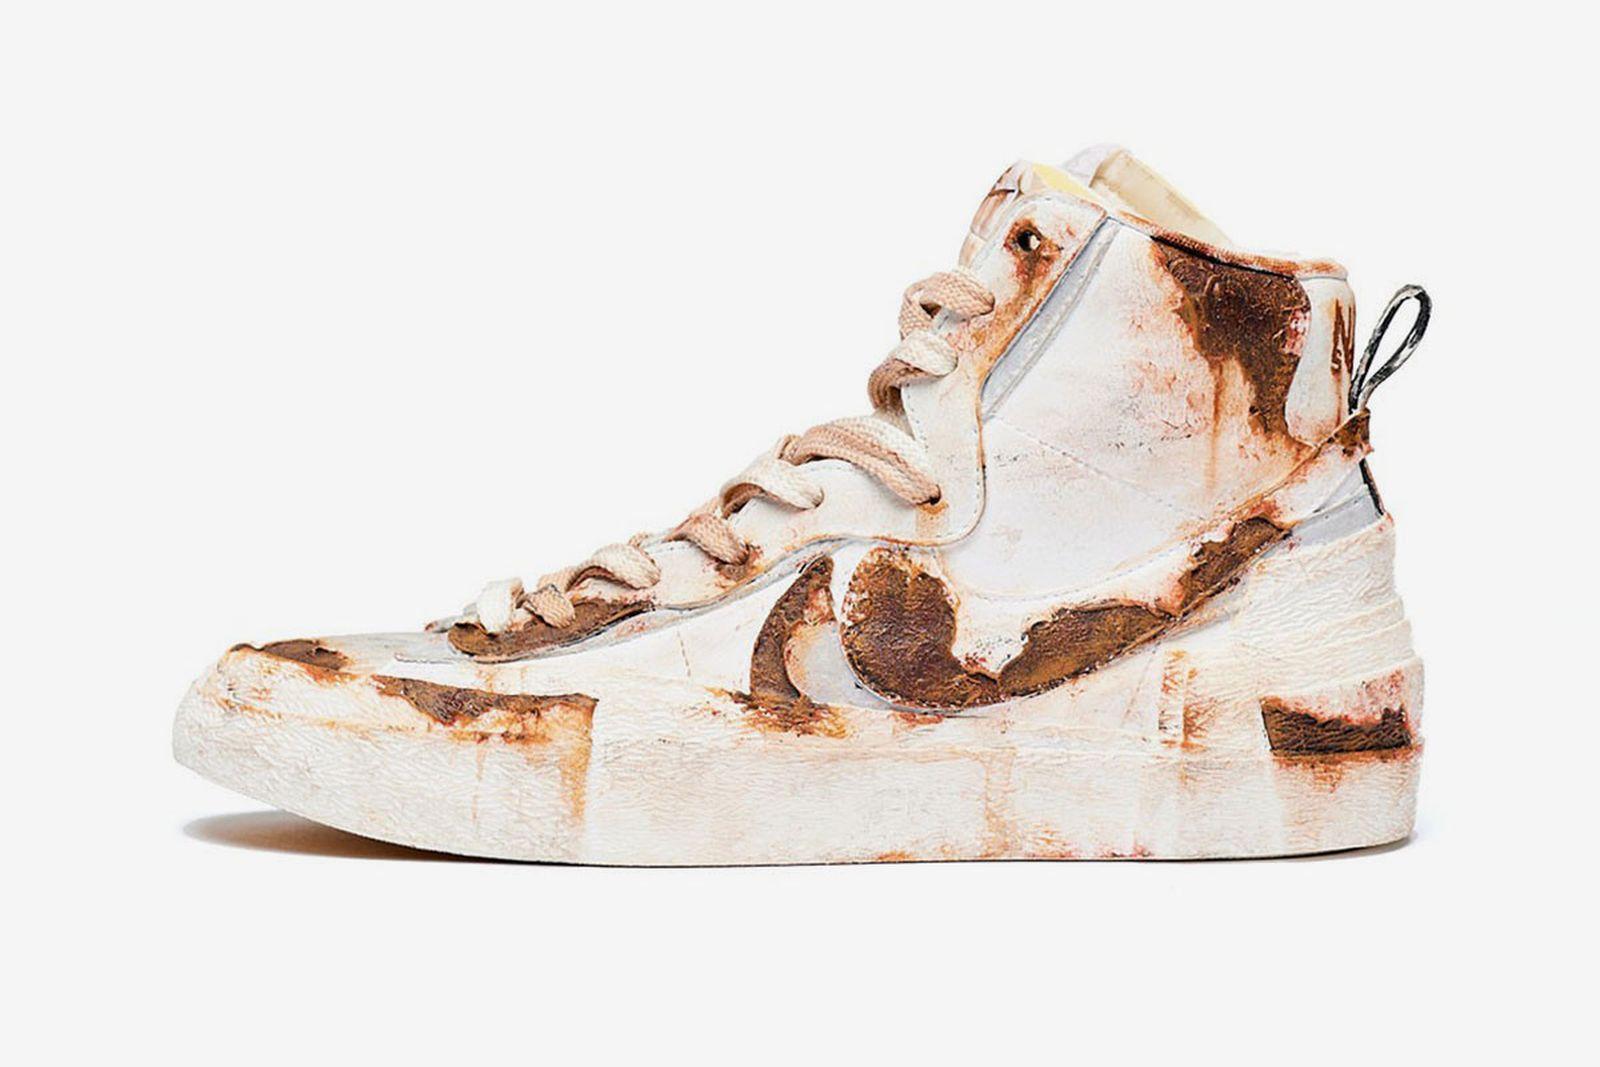 Principe Privé's Custom sacai x Nike Blazer a